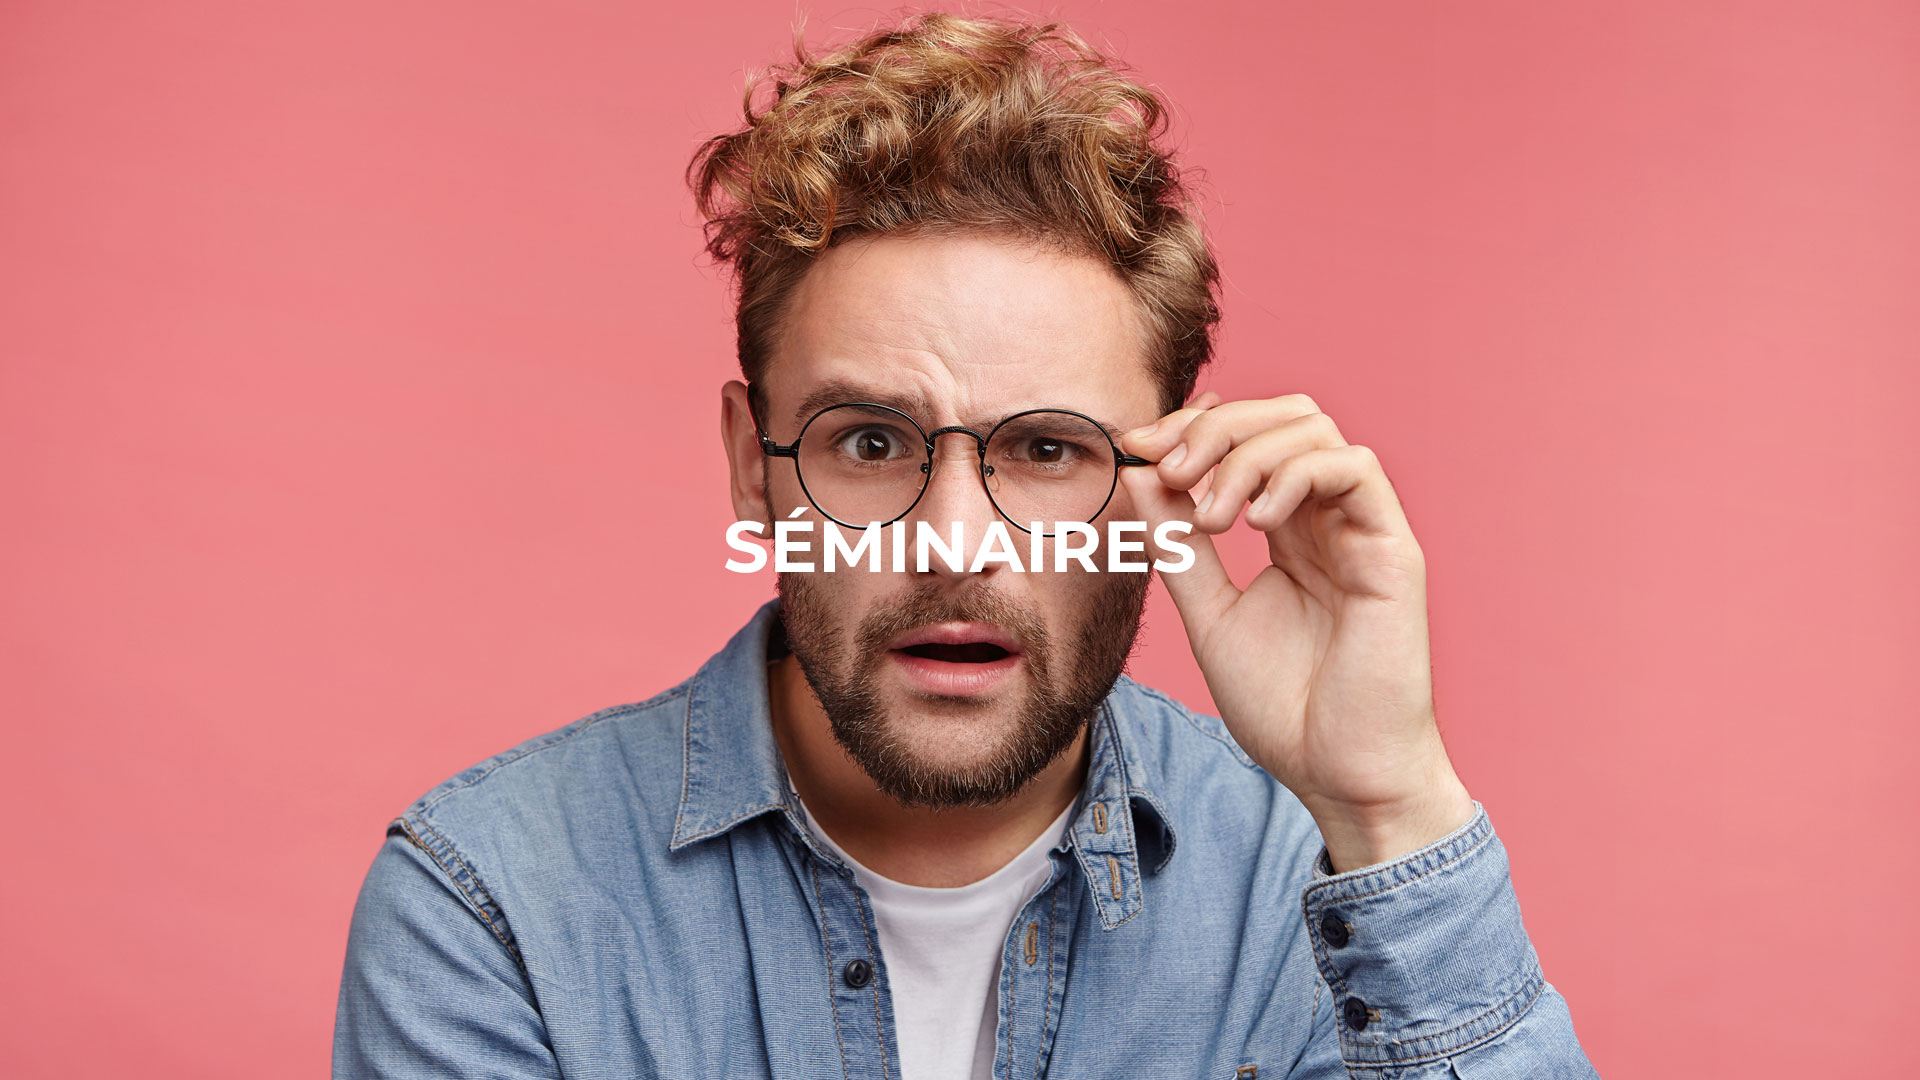 séminaires-v1